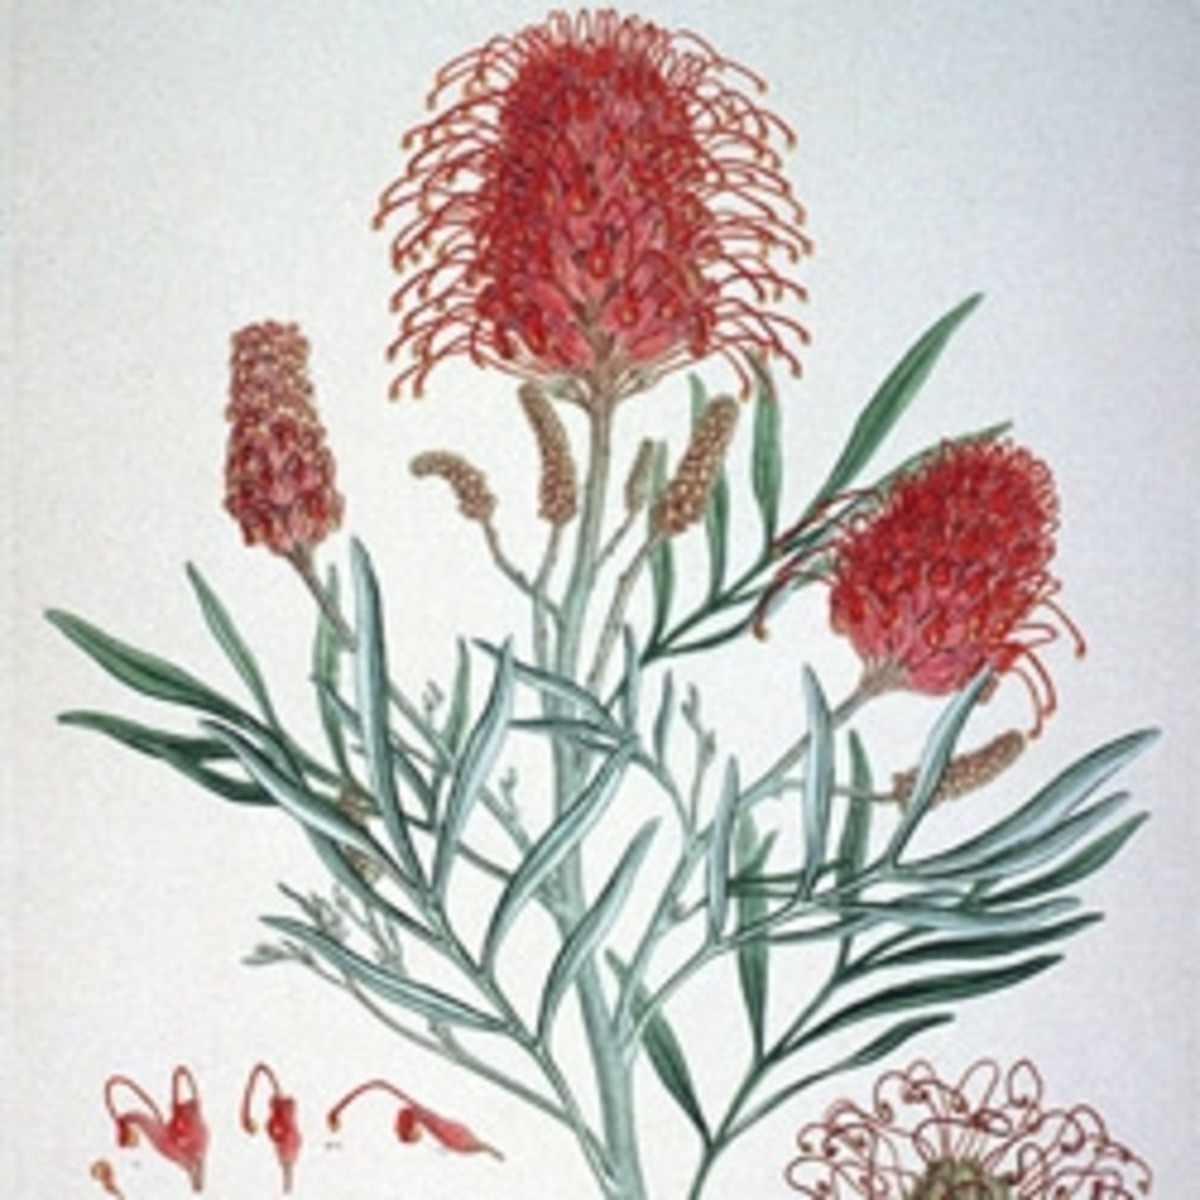 Makingamark's Botanical Art Compendium